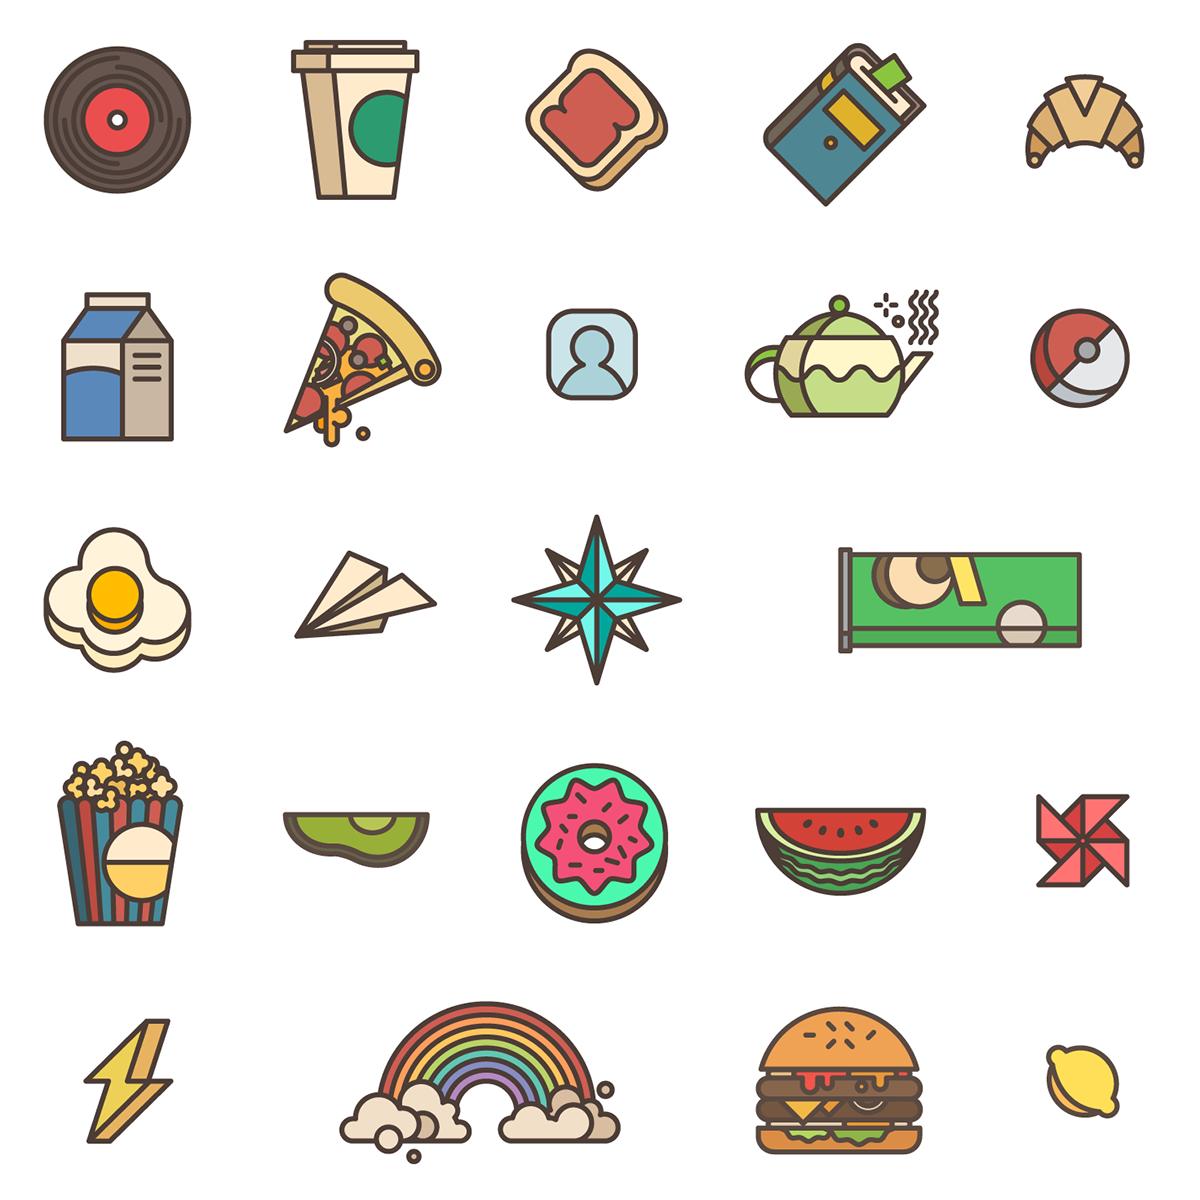 random objects on behance